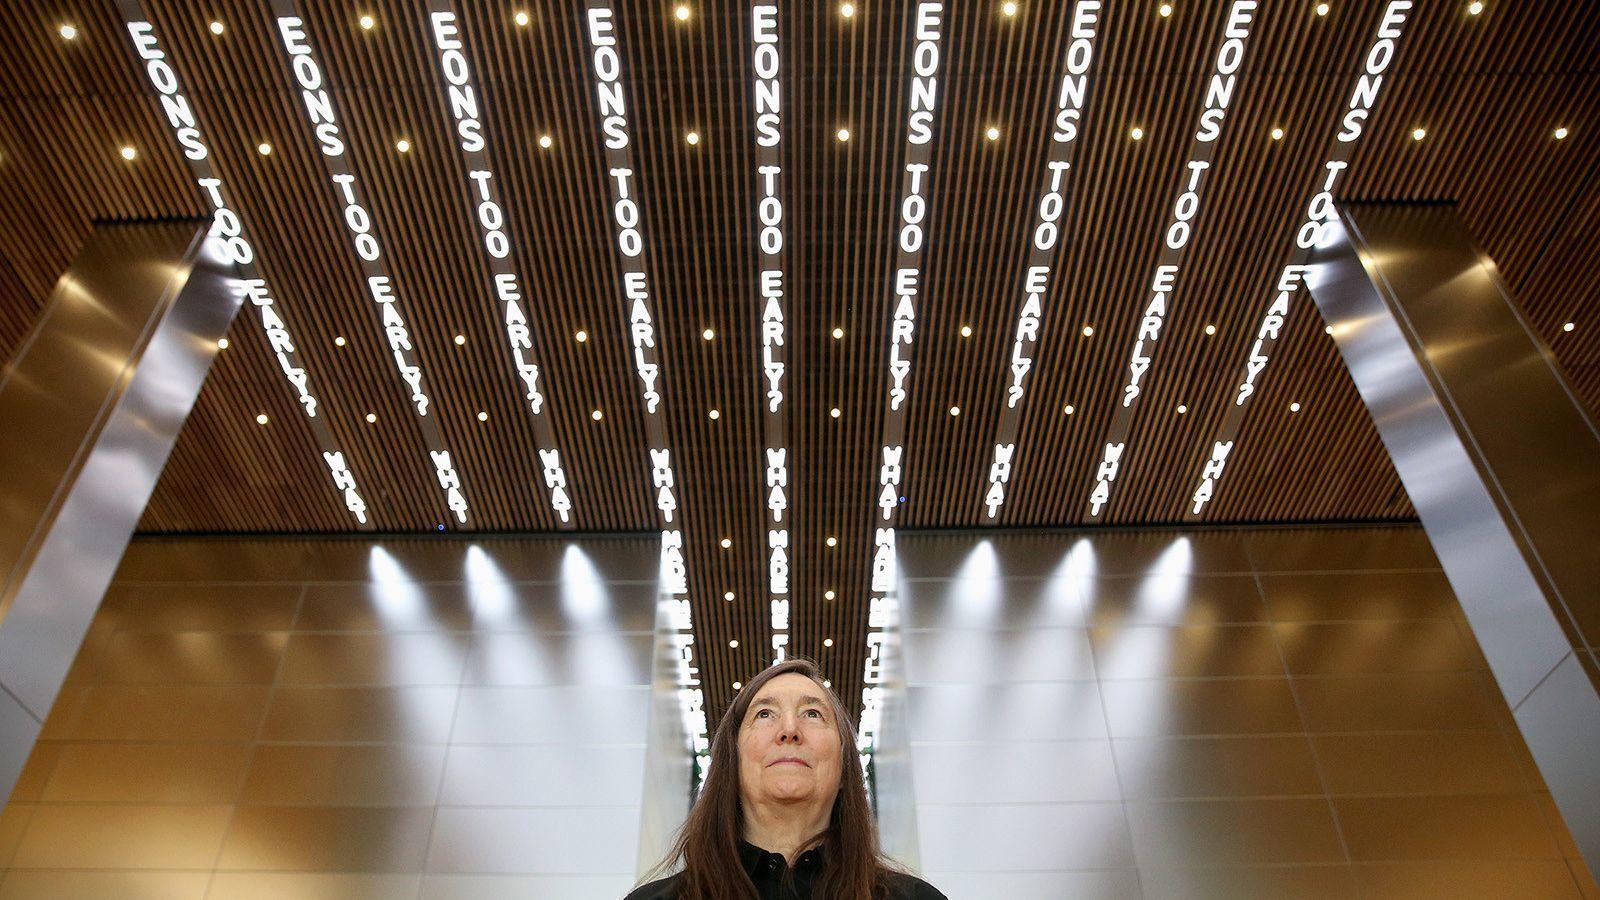 Desert X art show puts a Jenny Holzer installation on hold over animal welfare worries